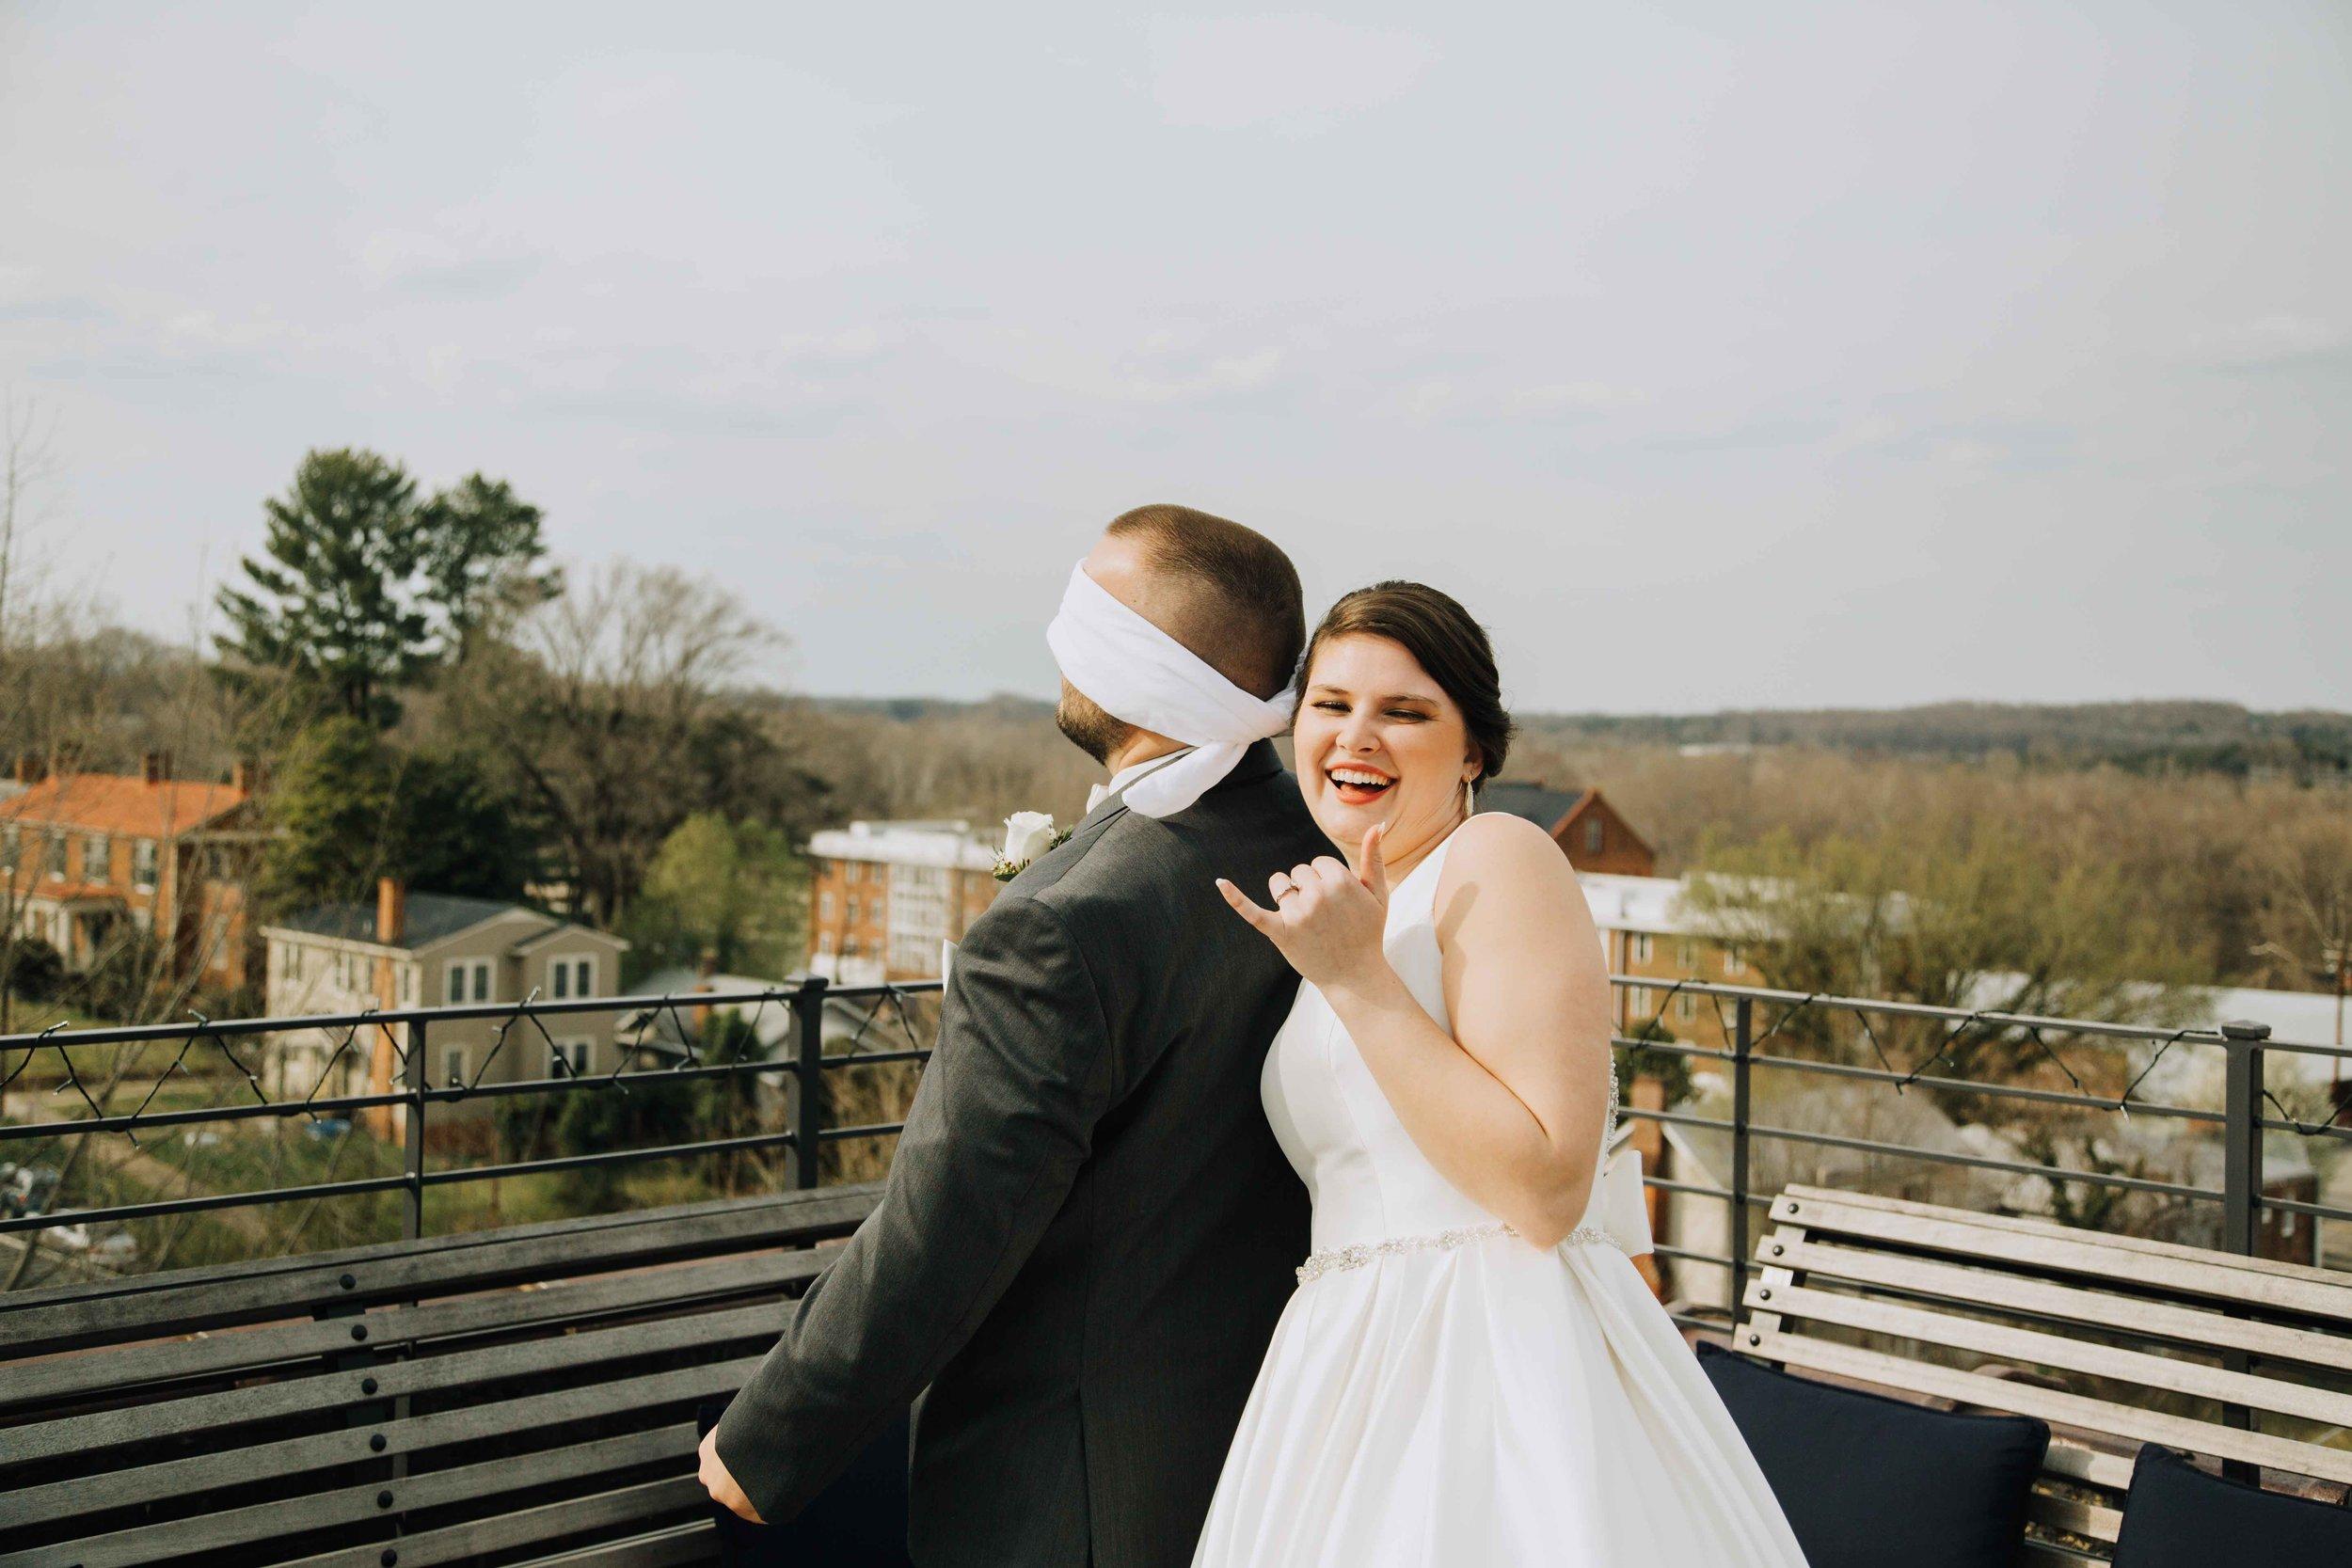 Farmville-Virginia-Wedding-Hotel-Weynoke-Downtown-Jacqueline-Waters-Photography-Detailed- (596).jpg